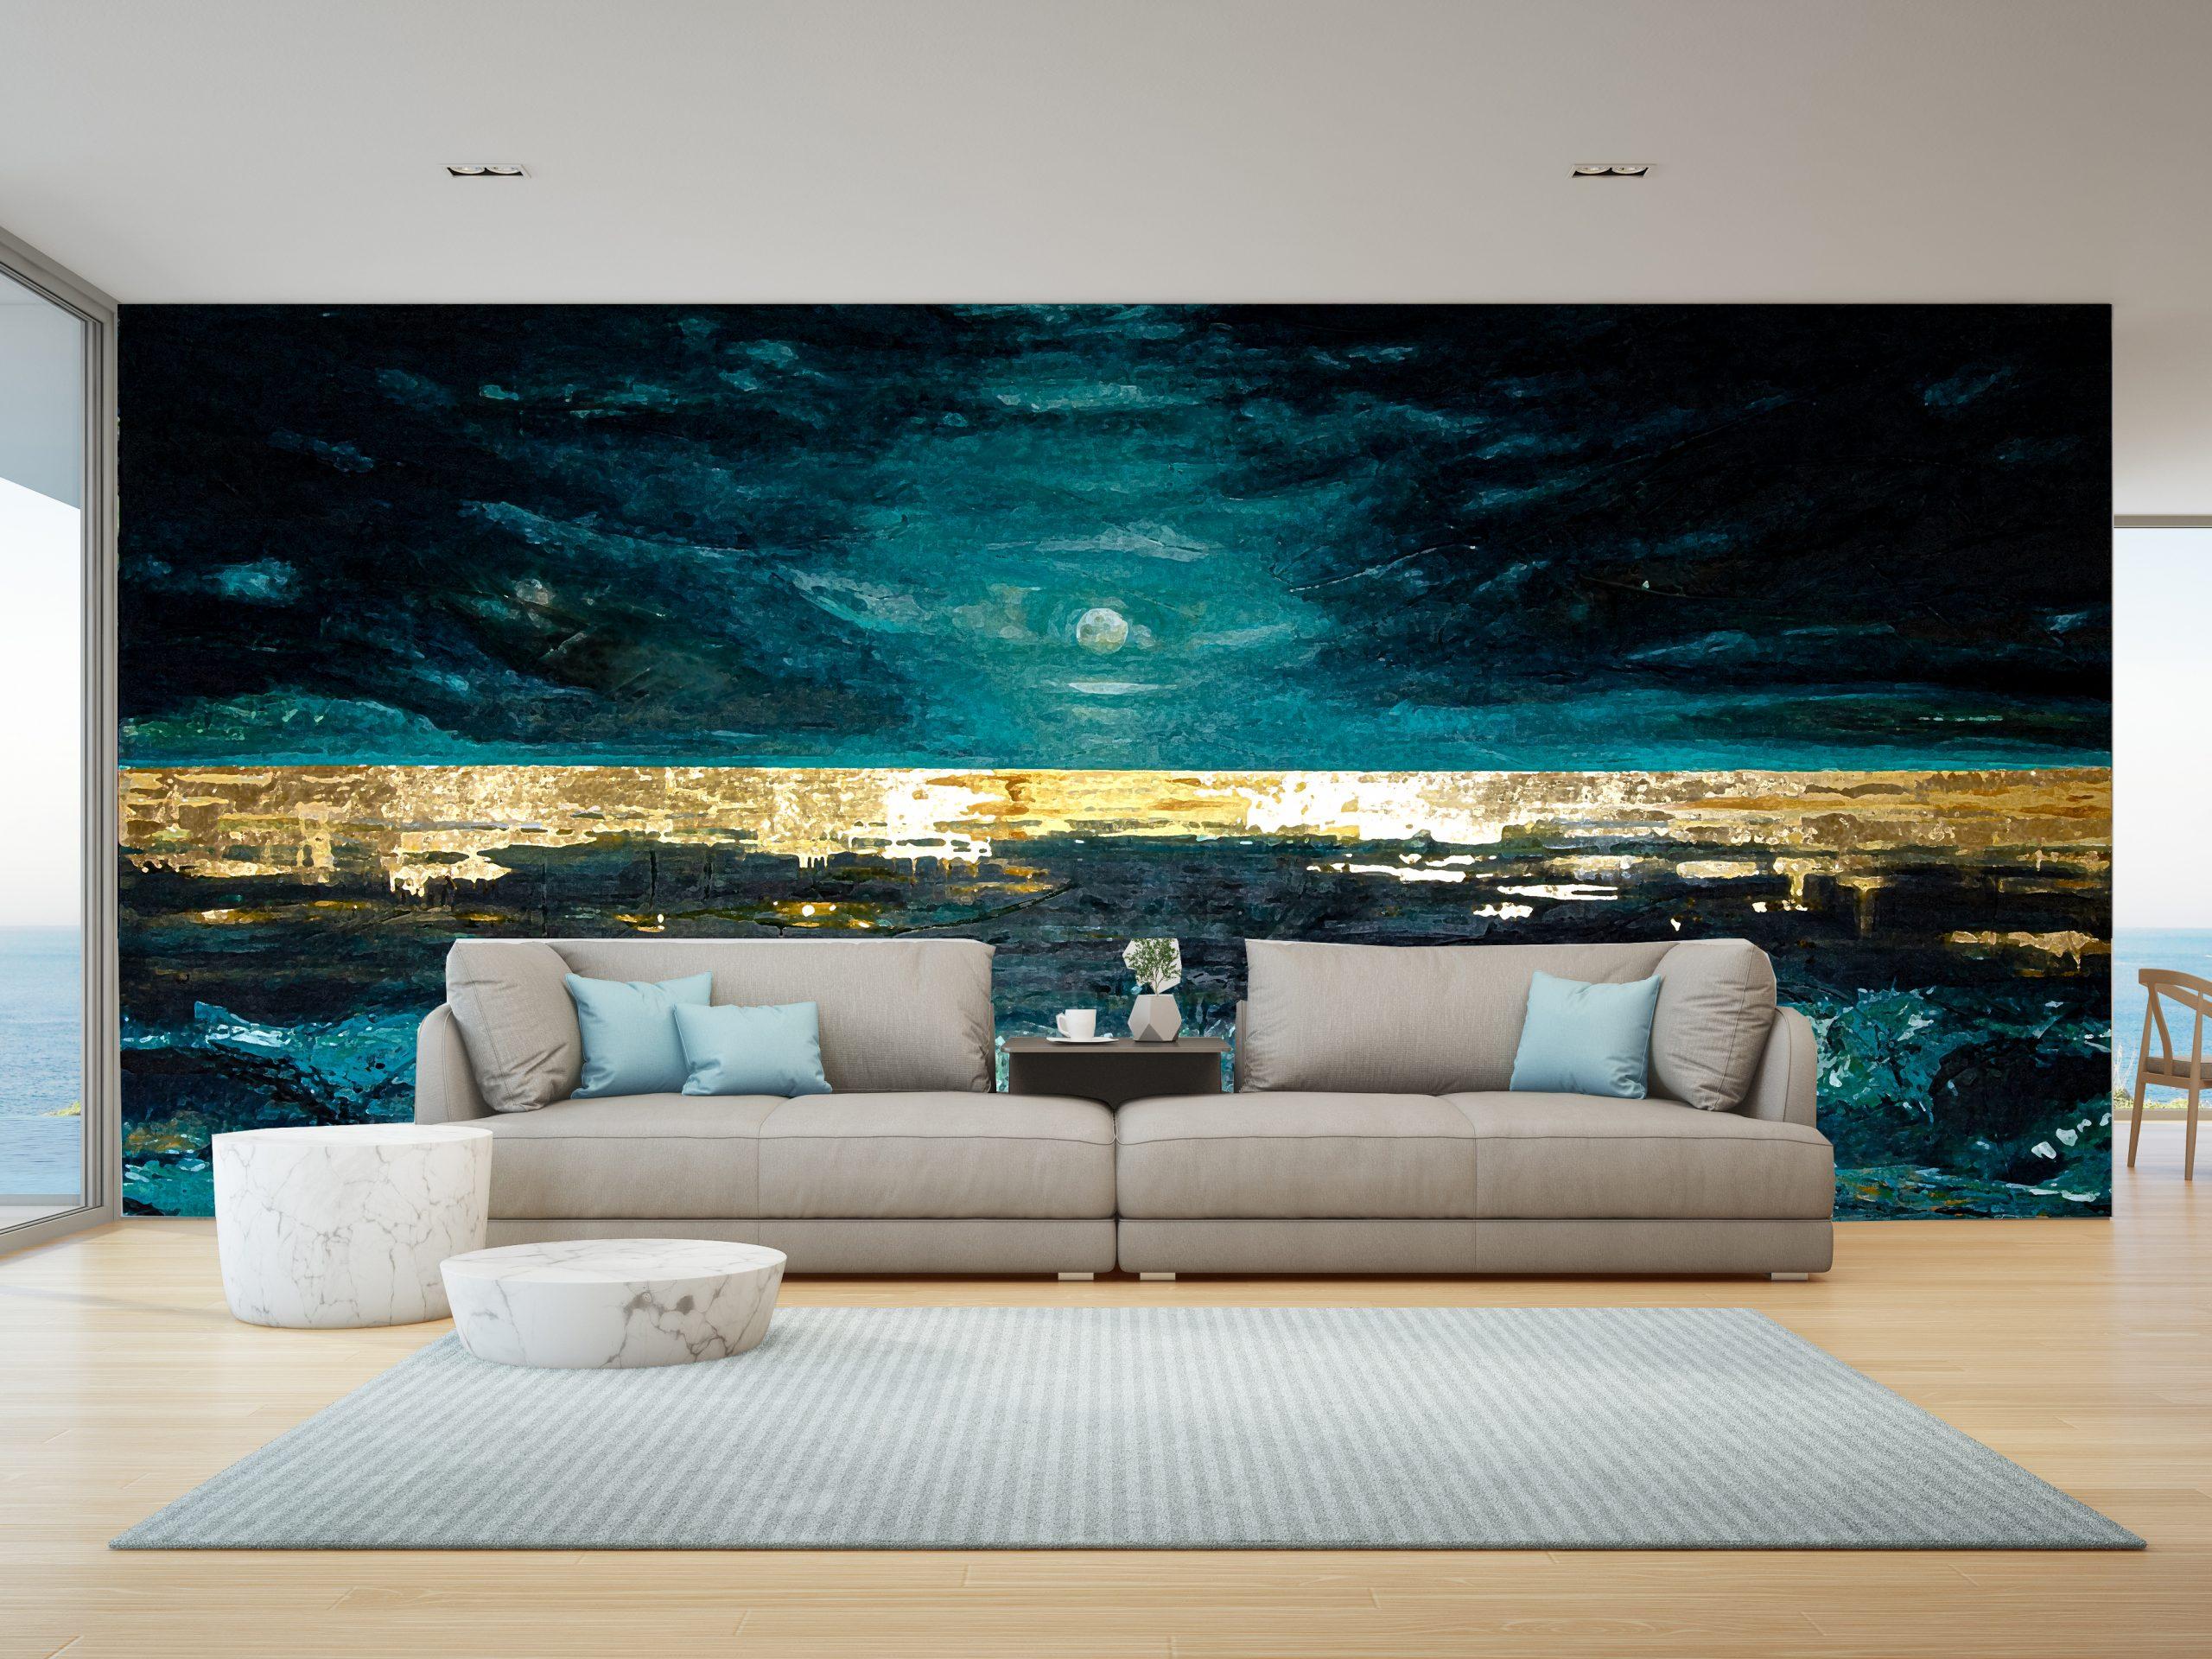 Seascape art wallpaper by Sharron Tancred The Mural Shop